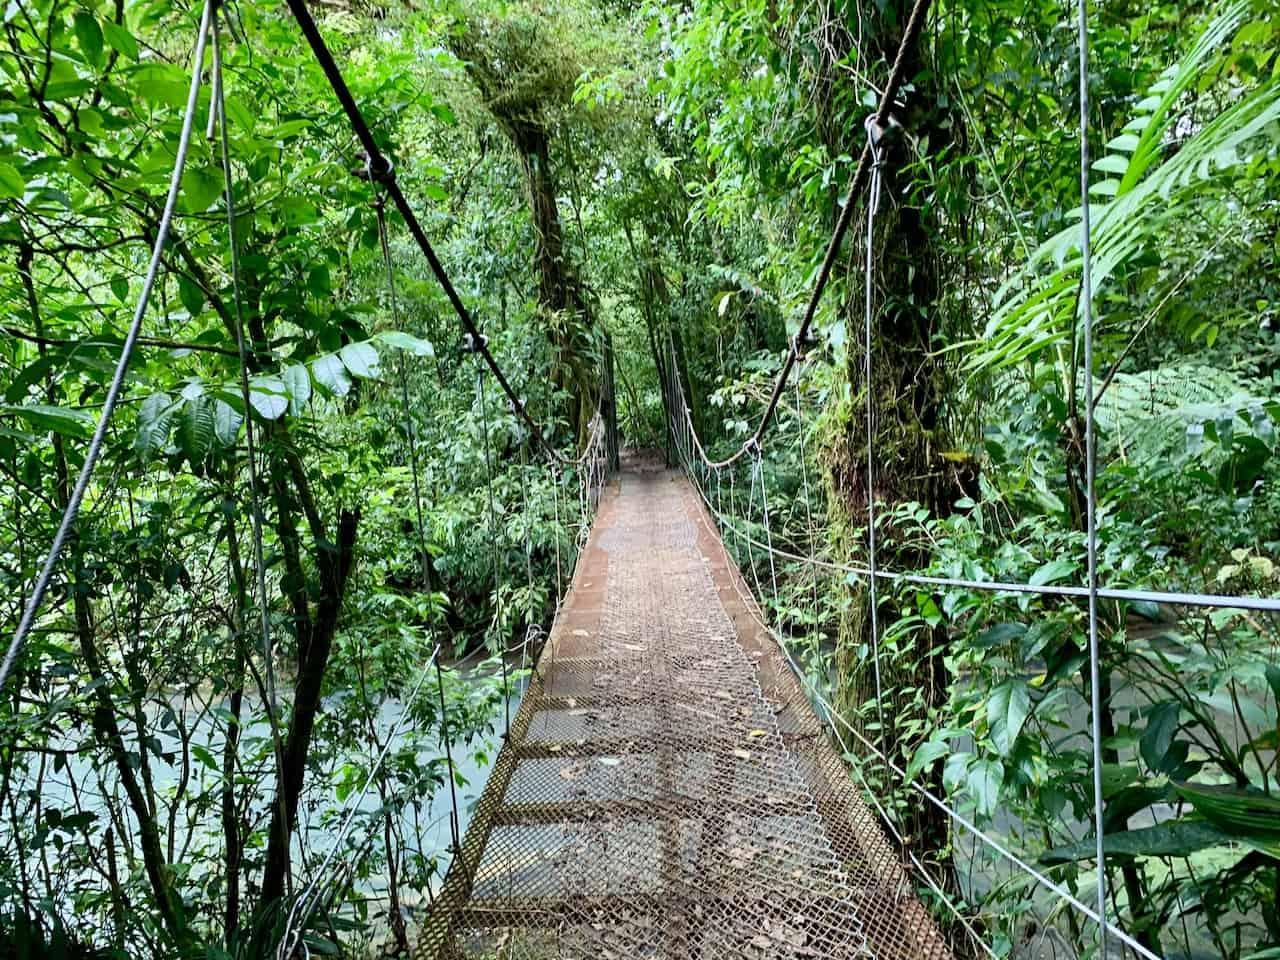 Celeste Suspension Bridge